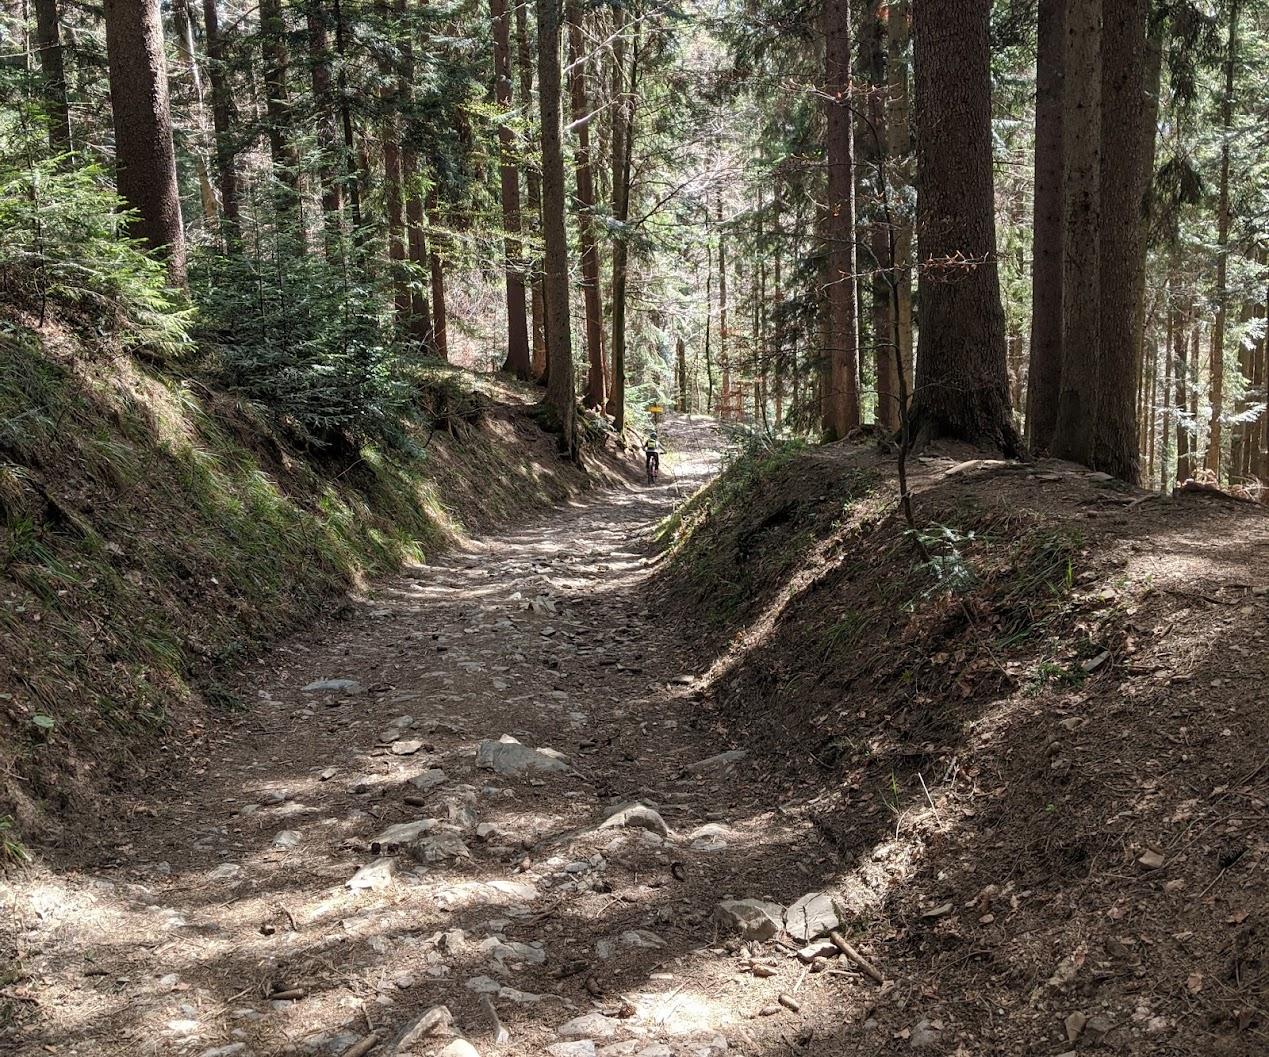 Neureuth - Schliersee - Tegernsee mtb - Apr 20